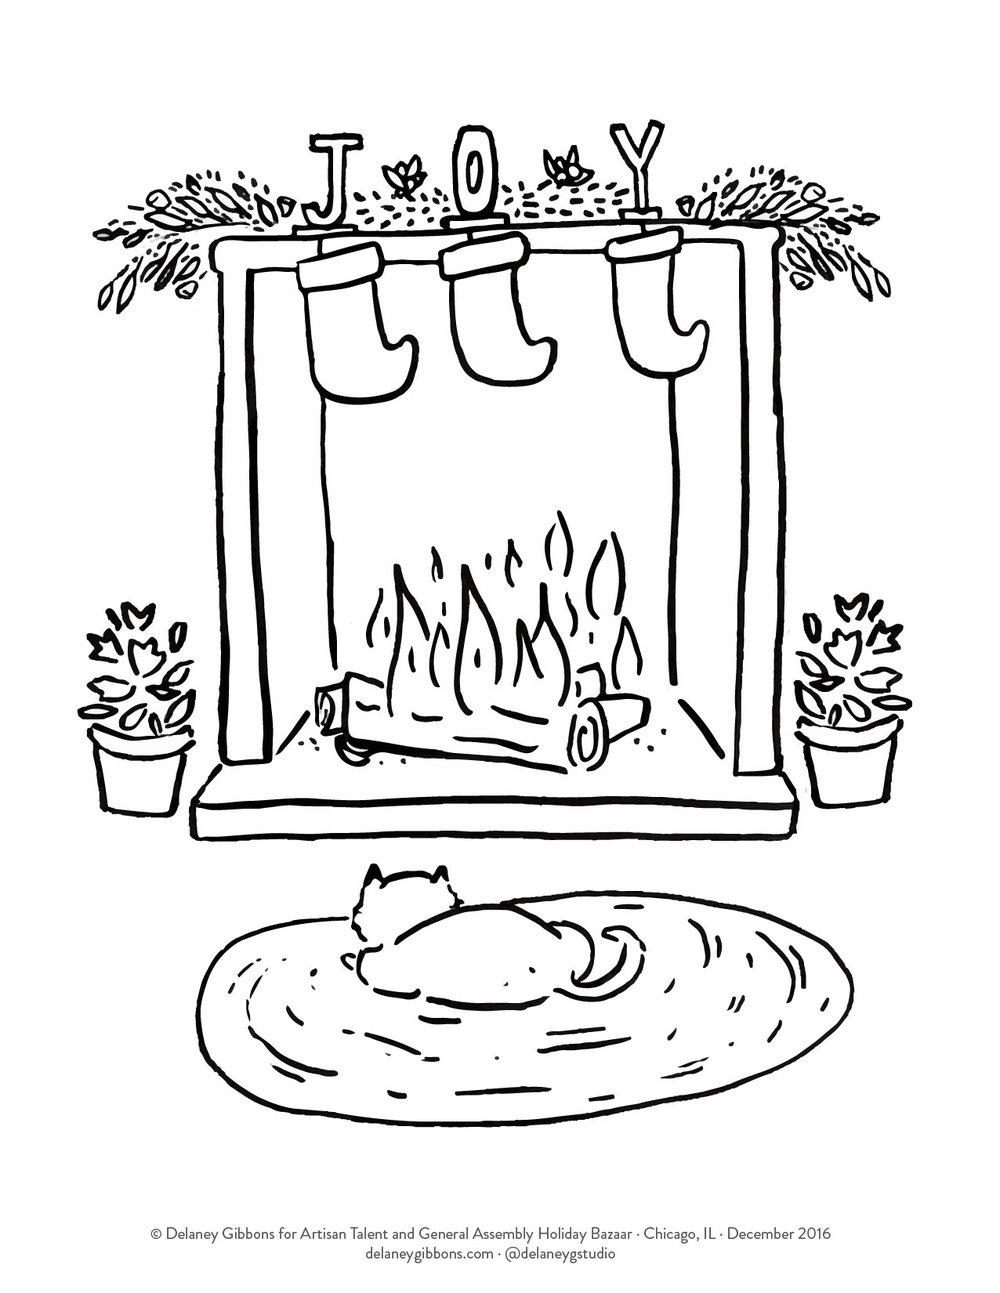 holidaydrawings-fireplace.jpg